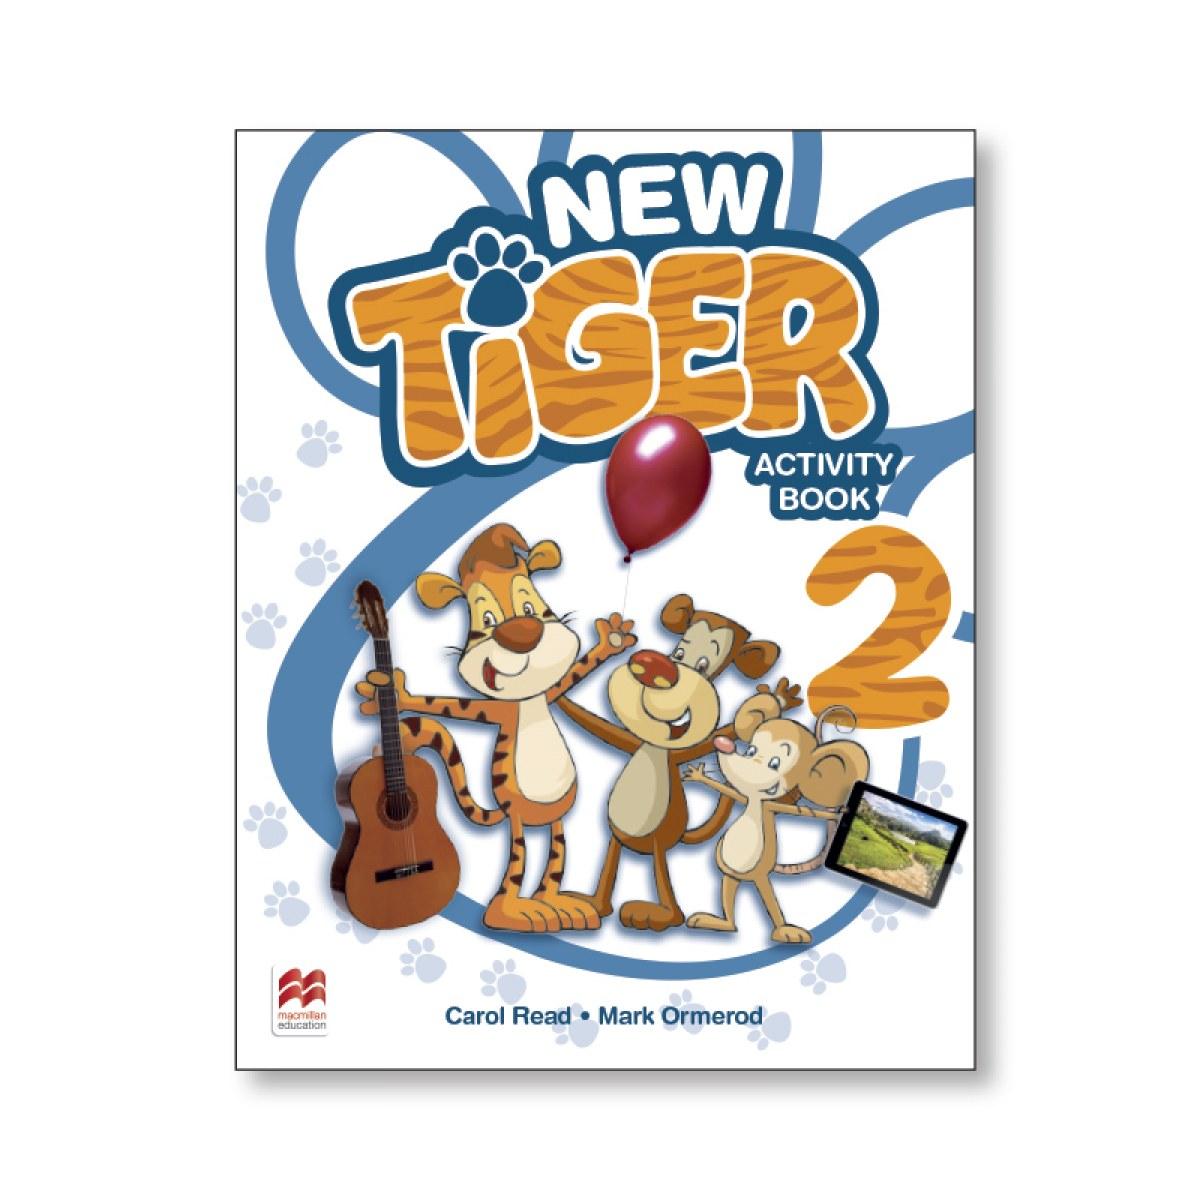 NEW TIGER 2 ACTIVITY BOOK 9781380009036